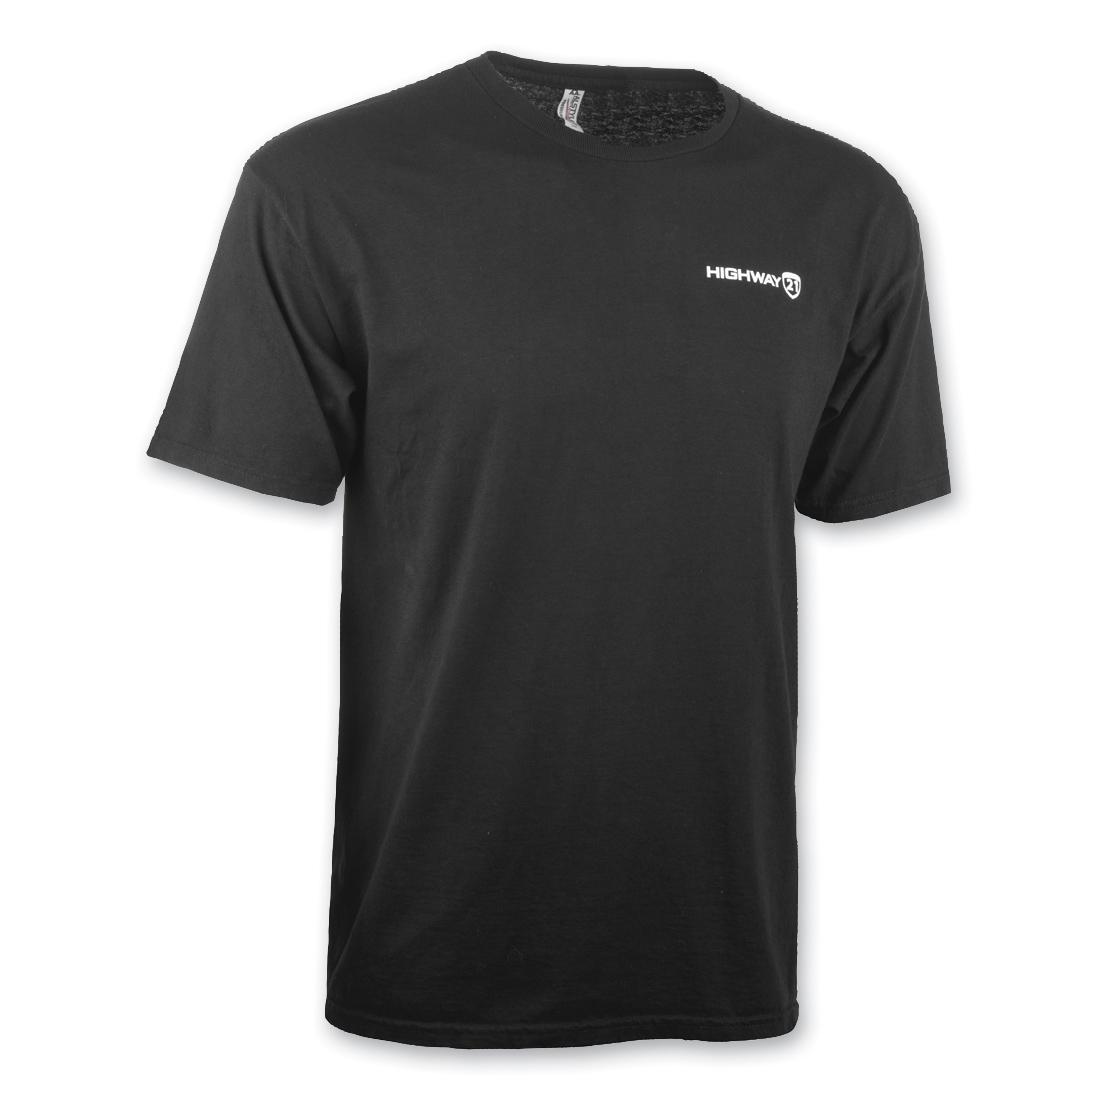 Highway 21 Men's Corporate Black Short-Sleeve T-Shirt